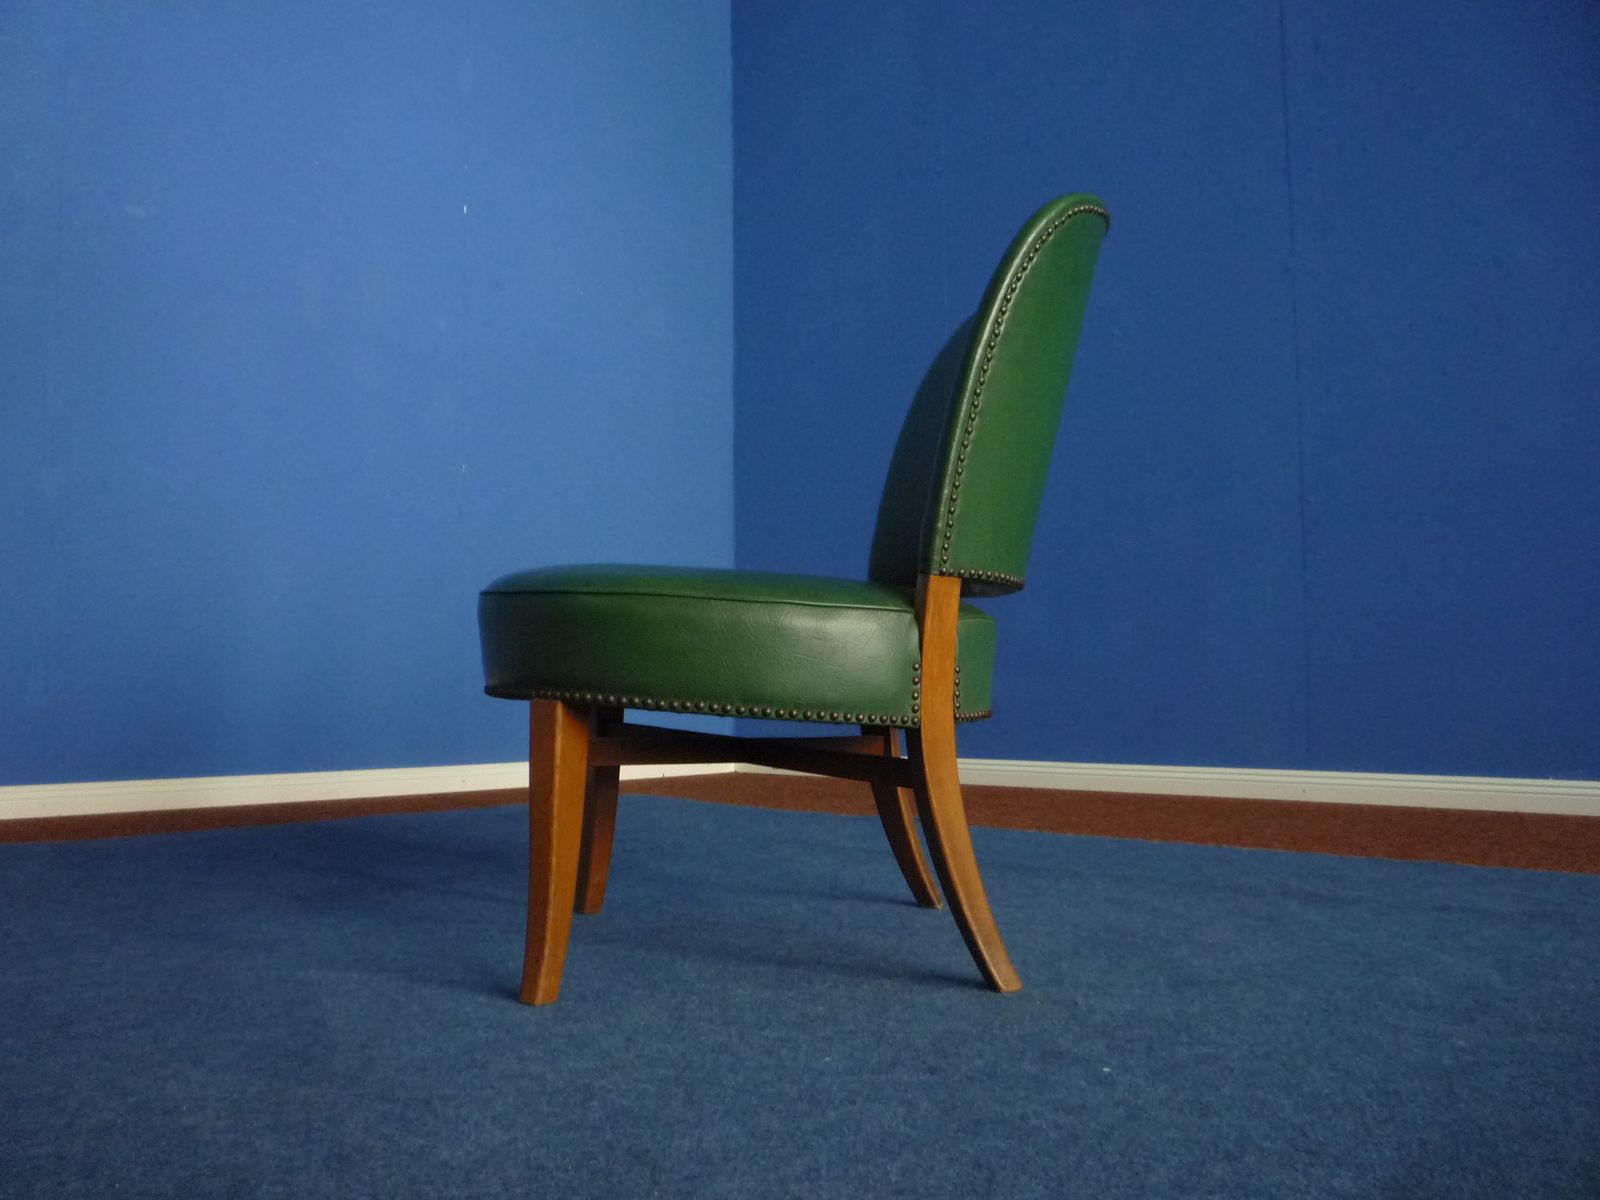 deutscher mid century kunstleder stuhl 1950er bei pamono. Black Bedroom Furniture Sets. Home Design Ideas